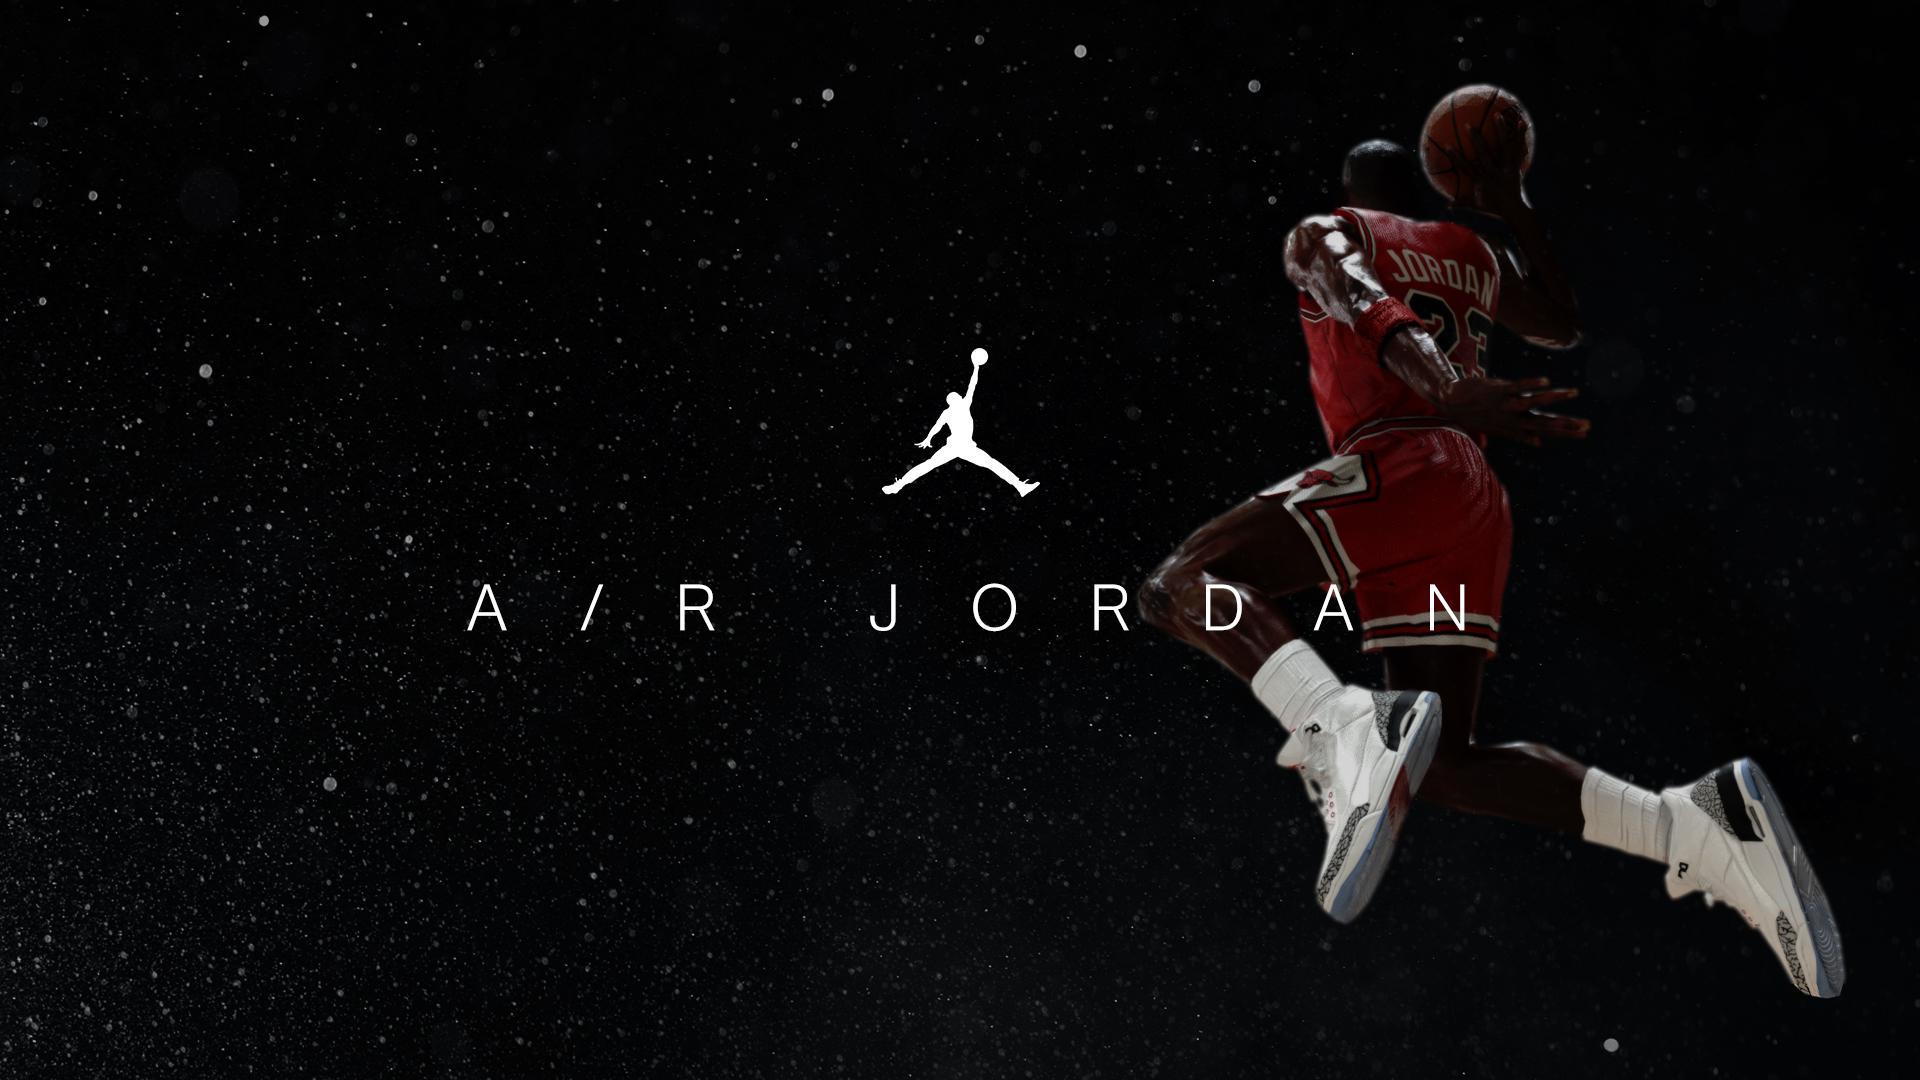 AR_Jordan_1.jpg